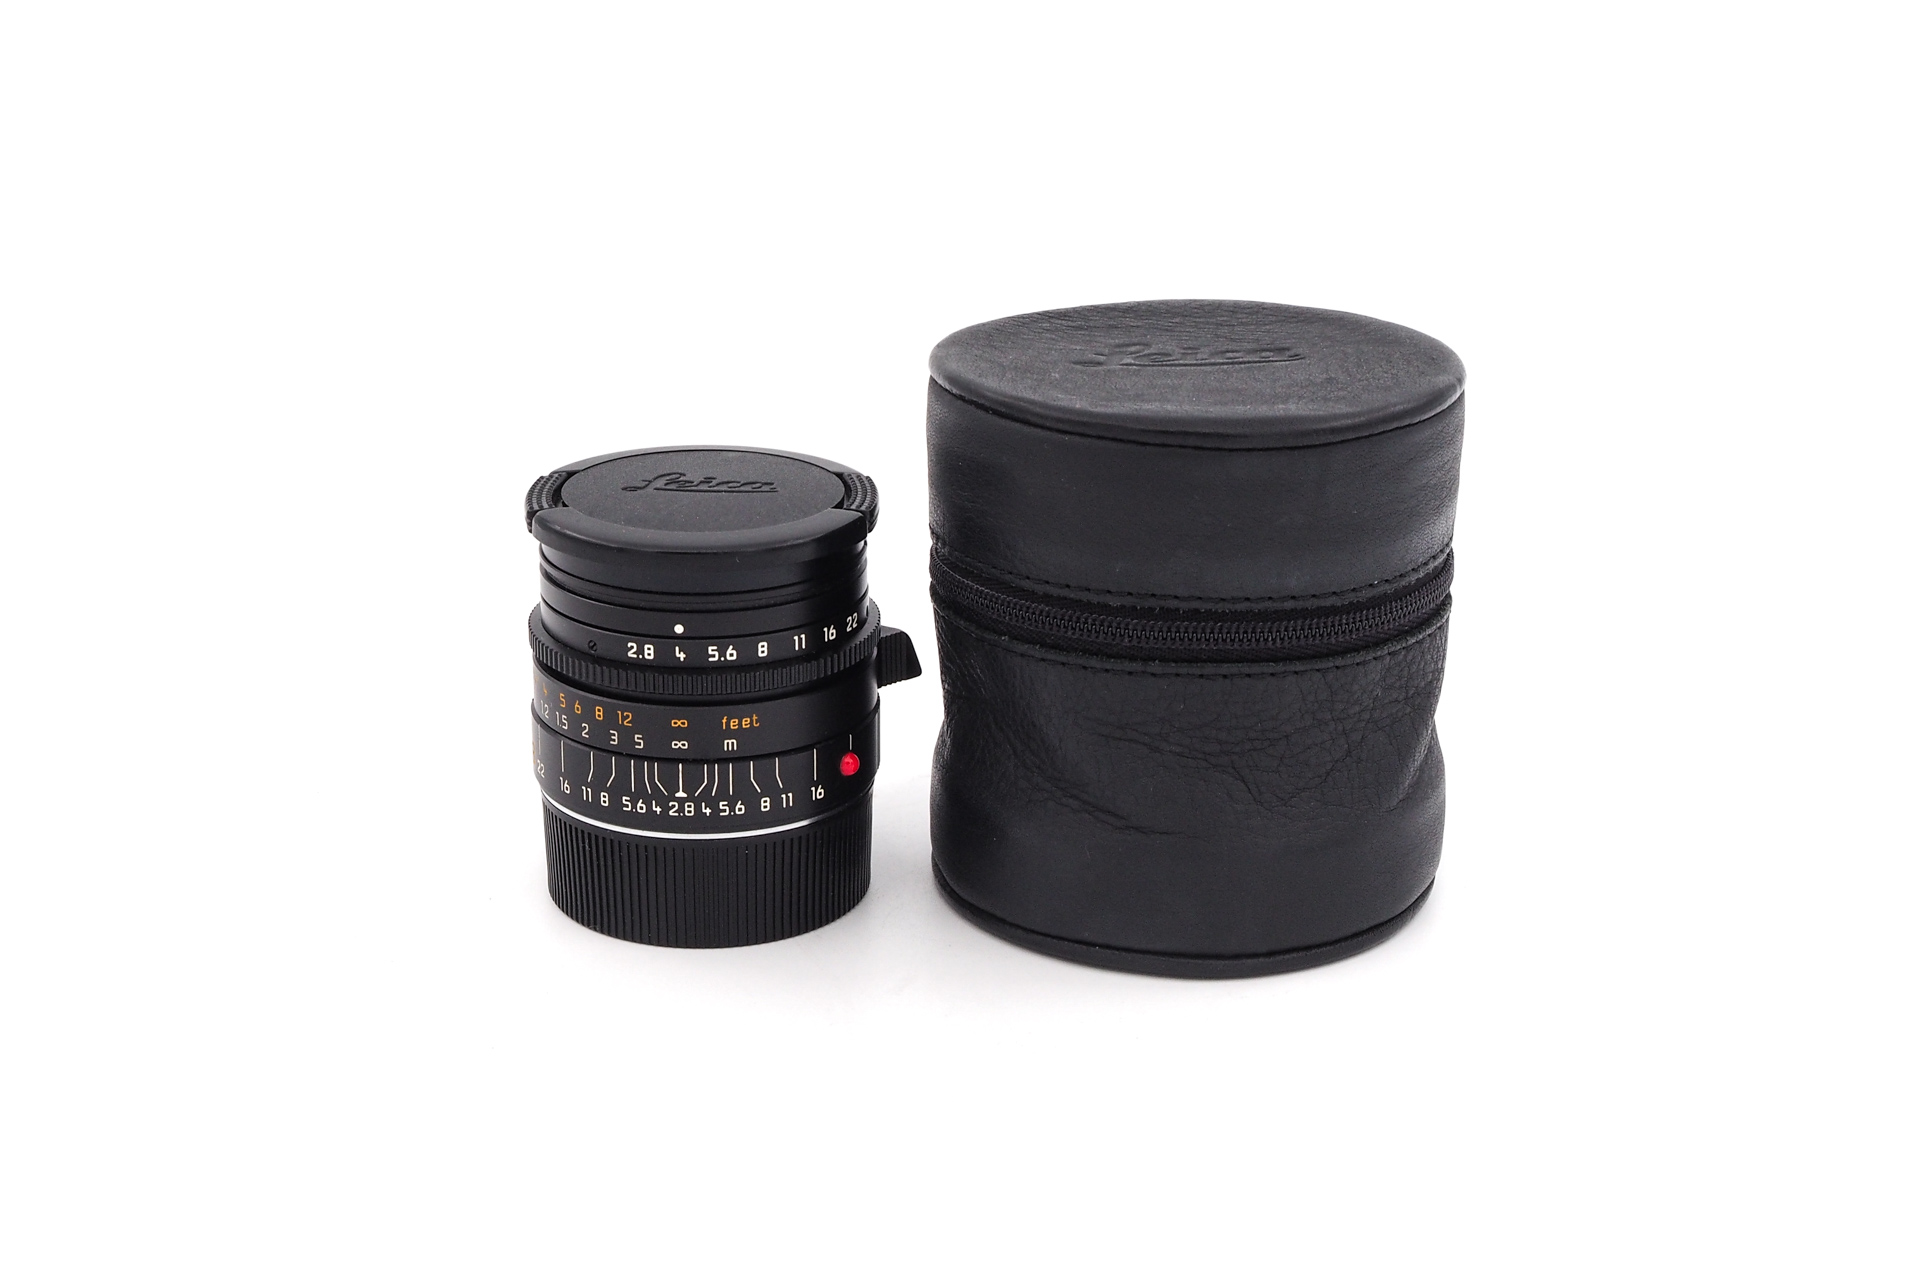 Leica Elmarit-M 1:2.8/28 IV